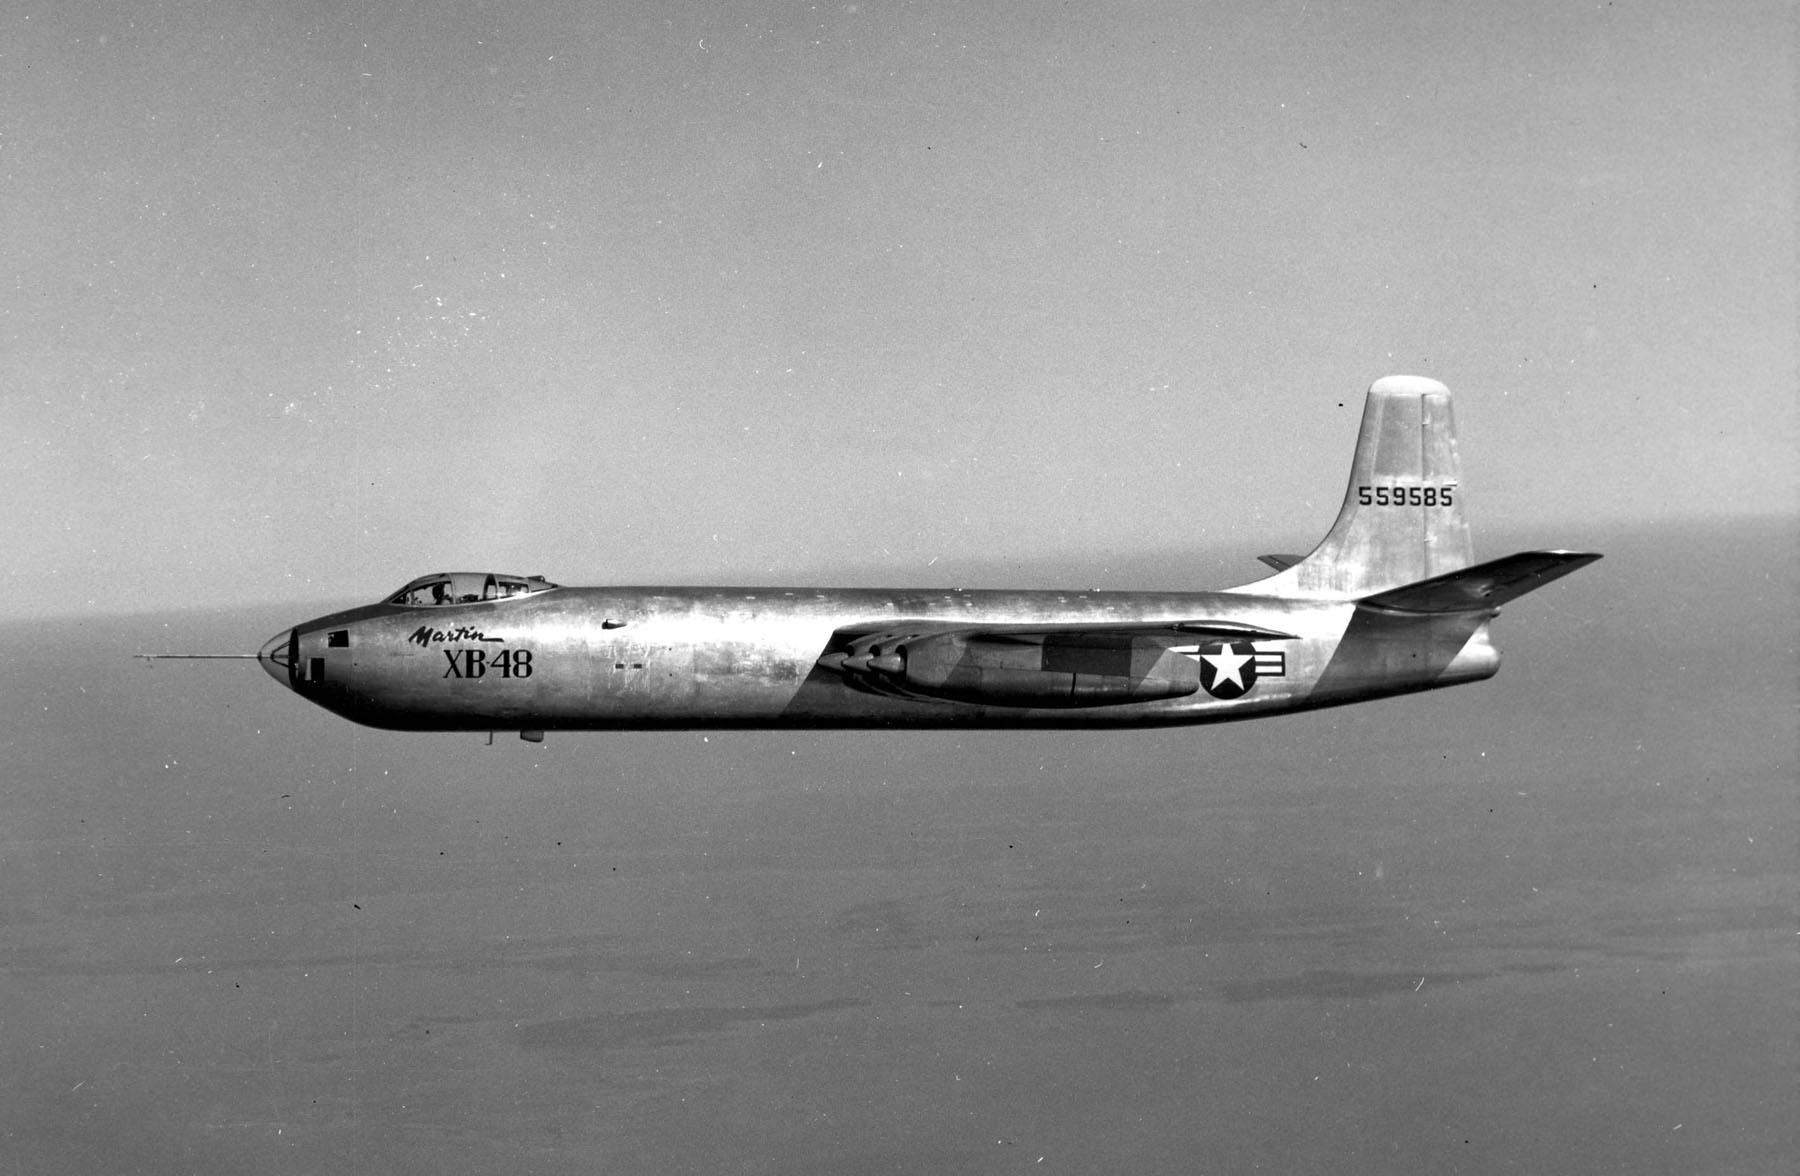 file martin xb 48 in flight 061025 f 1234s 017 jpg wikimedia commons